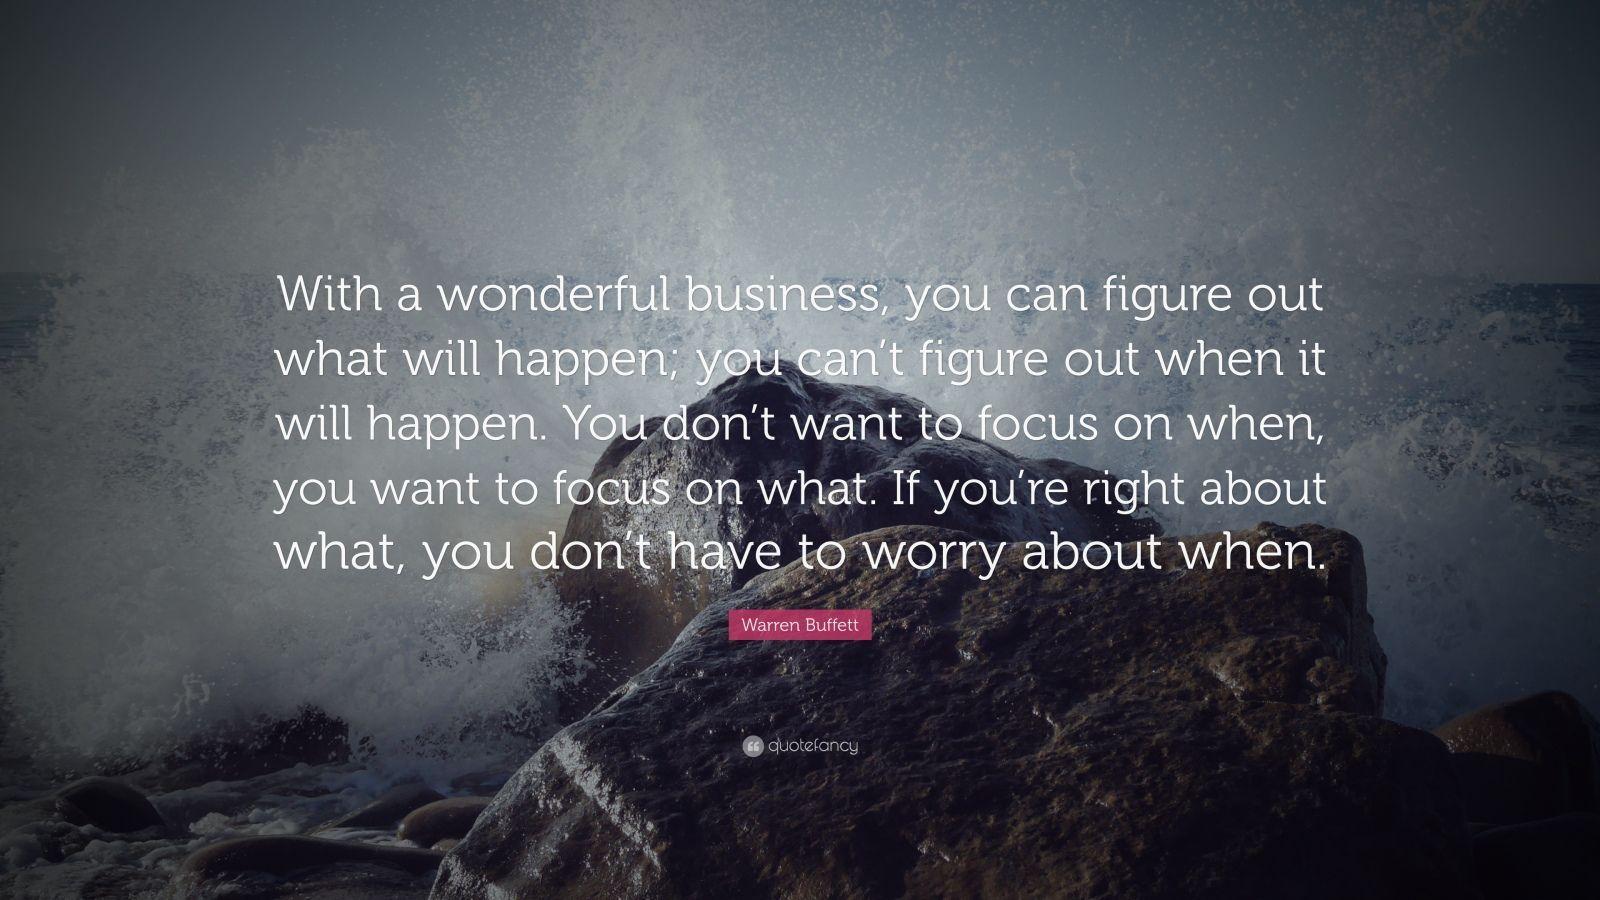 Inspirational quote number 38 from warren buffett